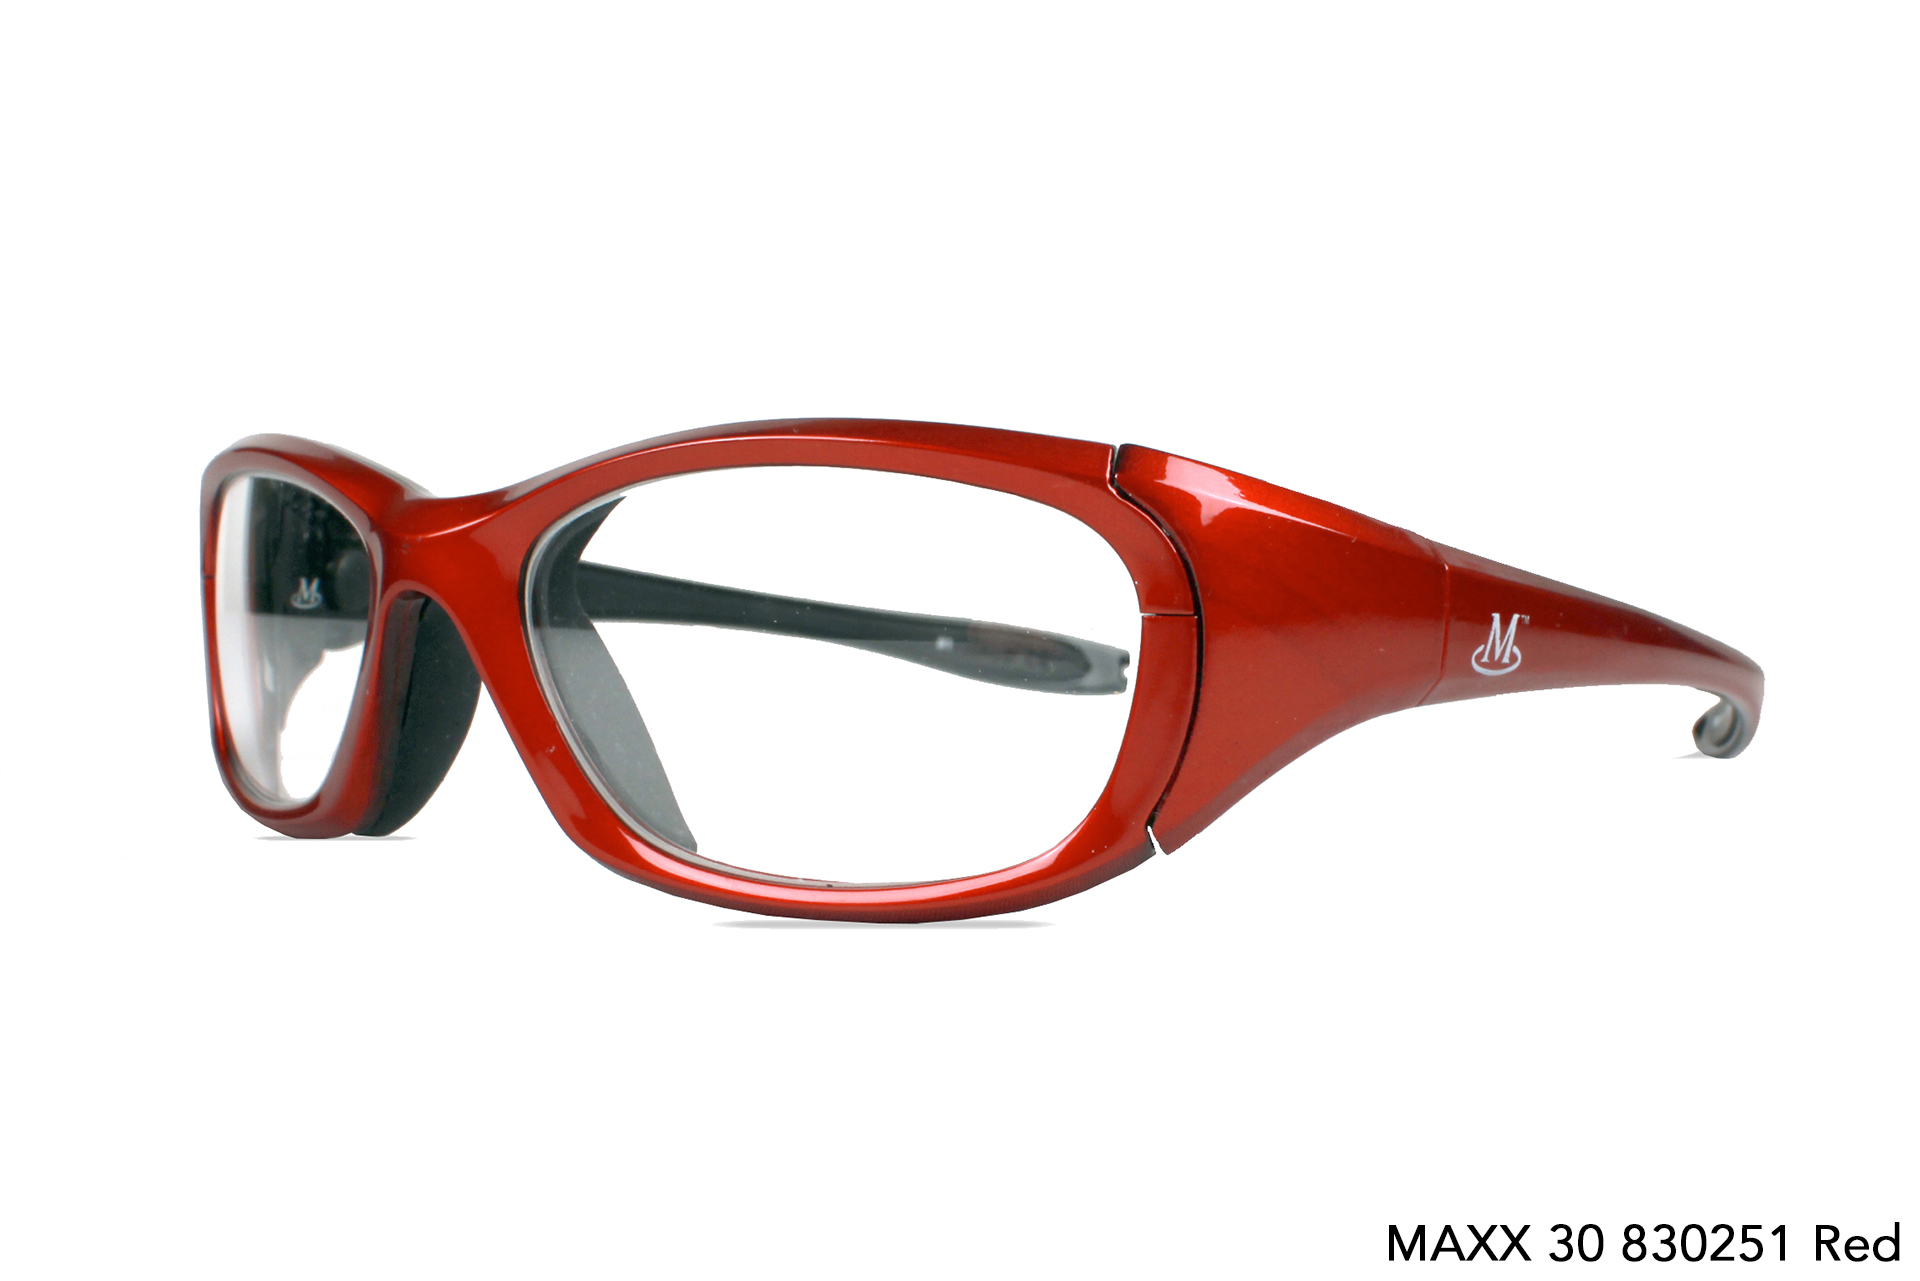 Maxx 30 830251 Red